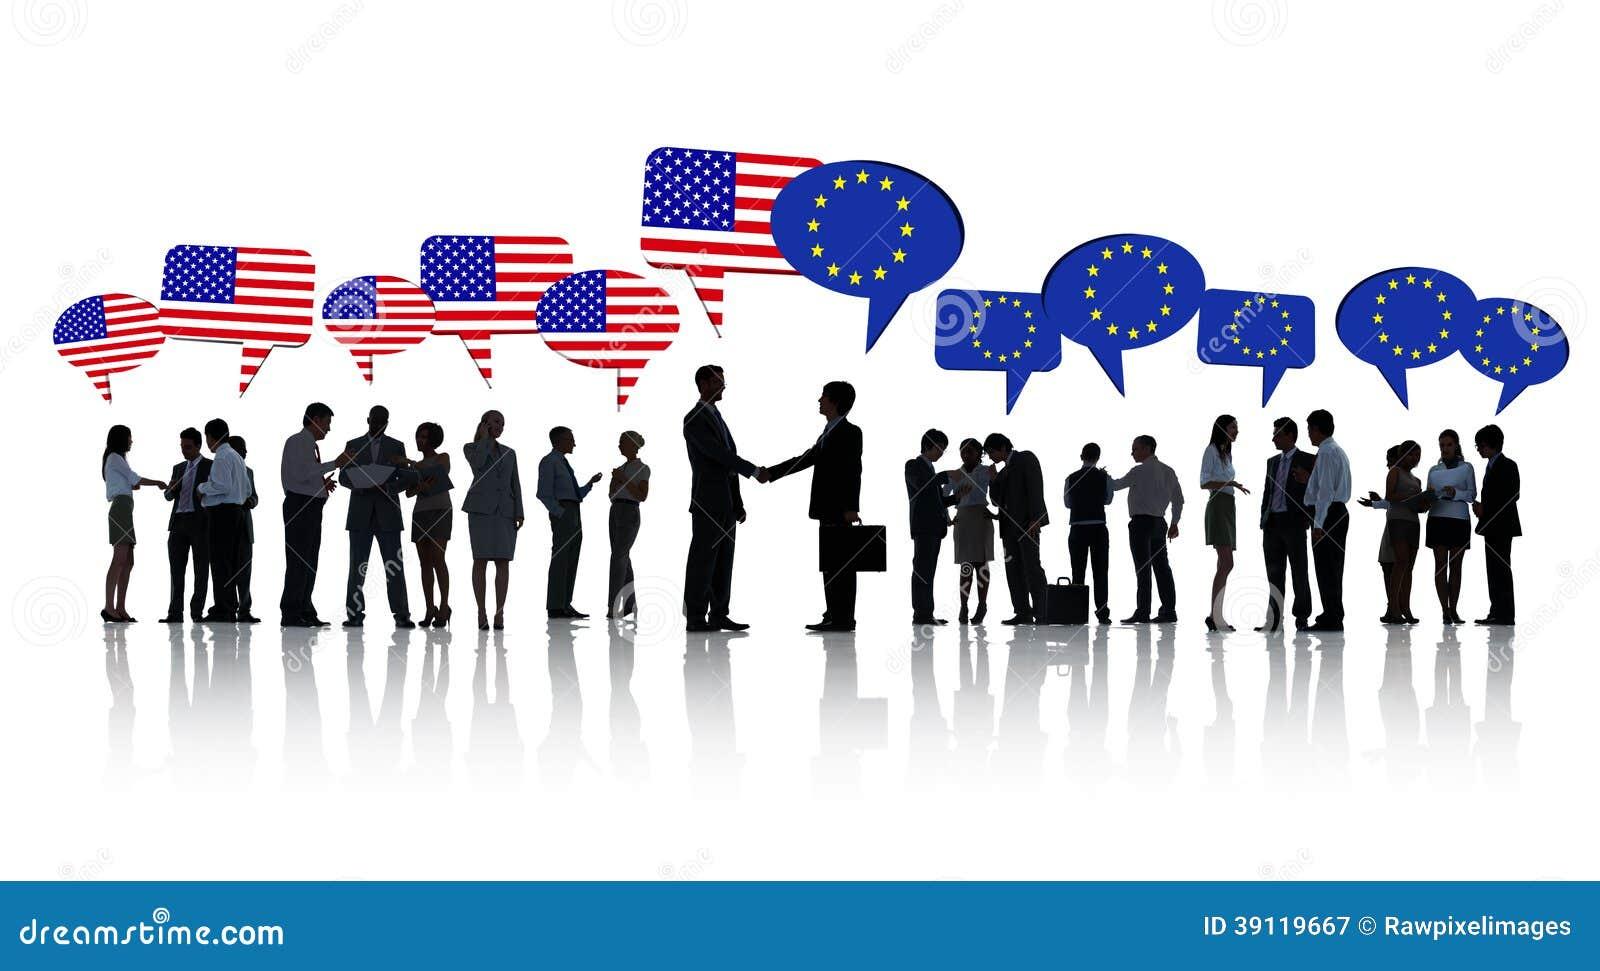 American European Group 74